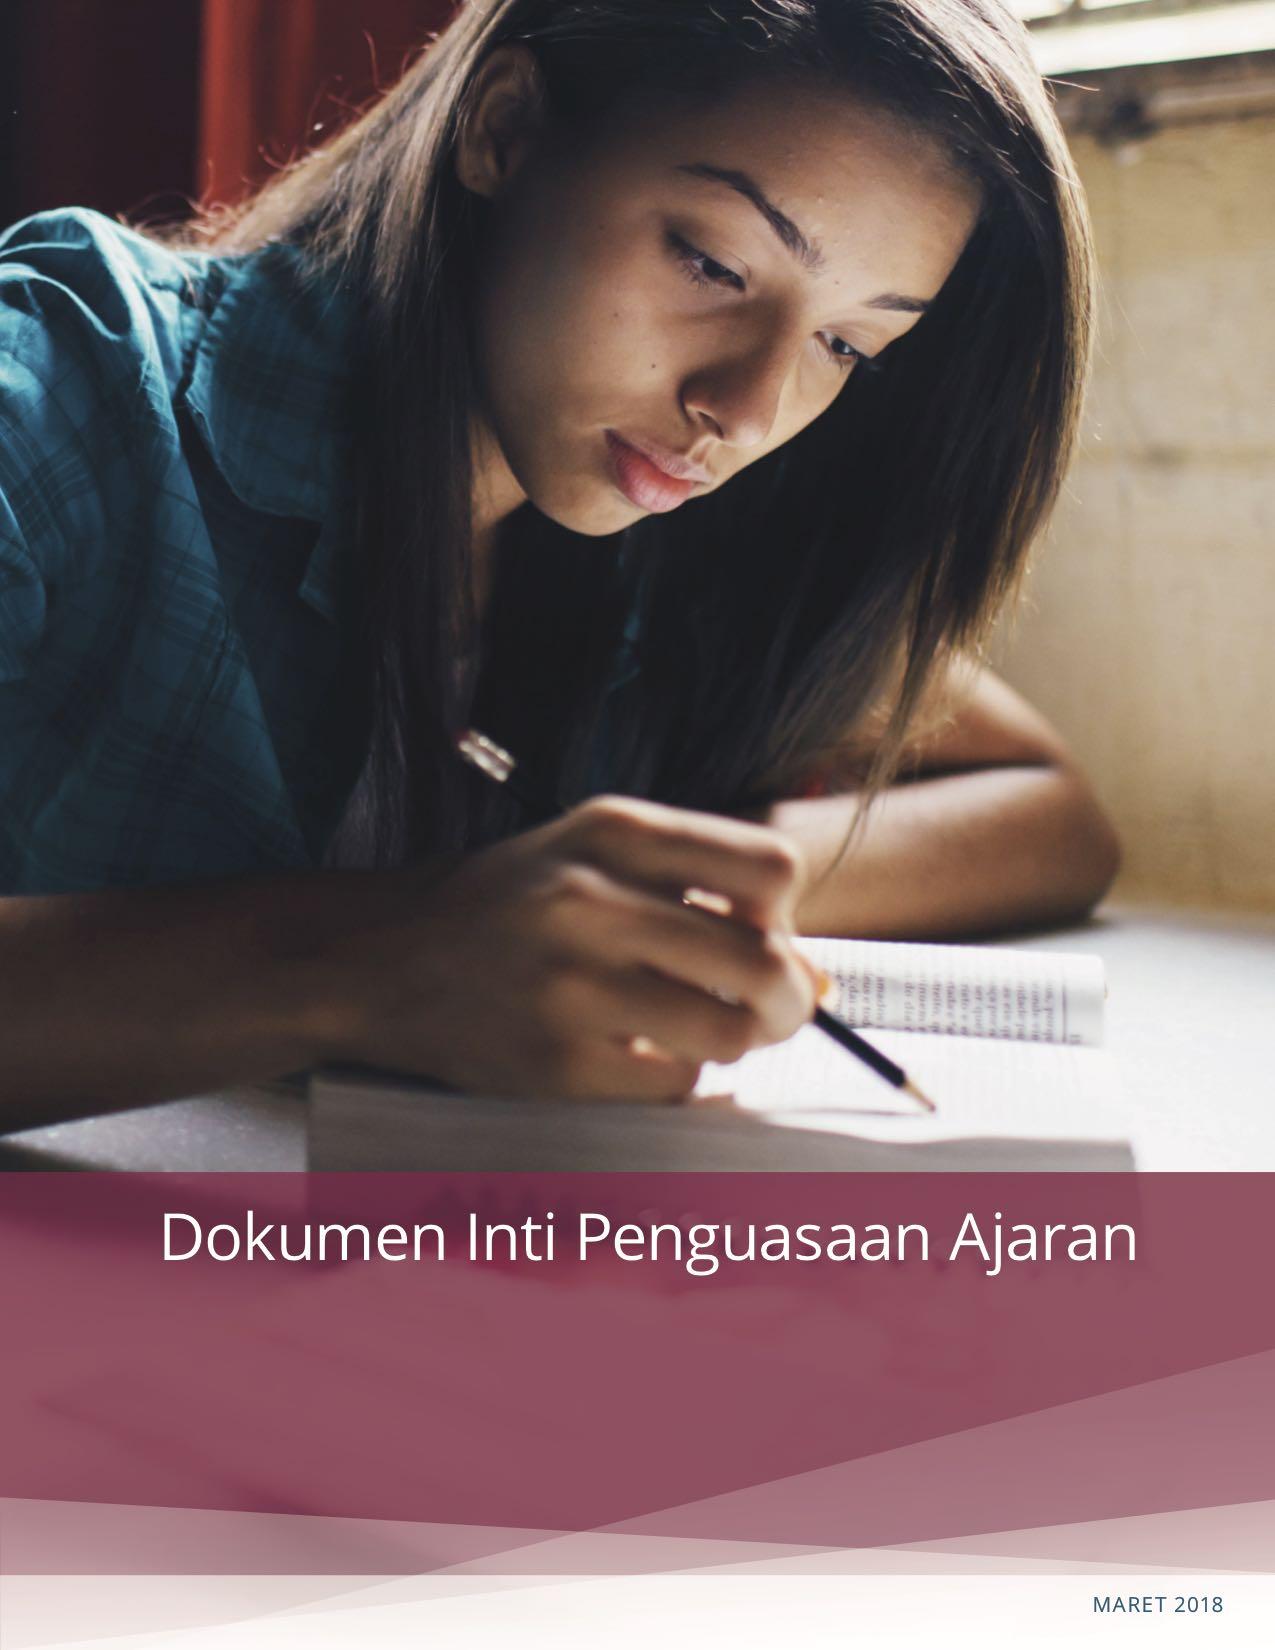 Kover Dokumen Inti Penguasaan Ajaran